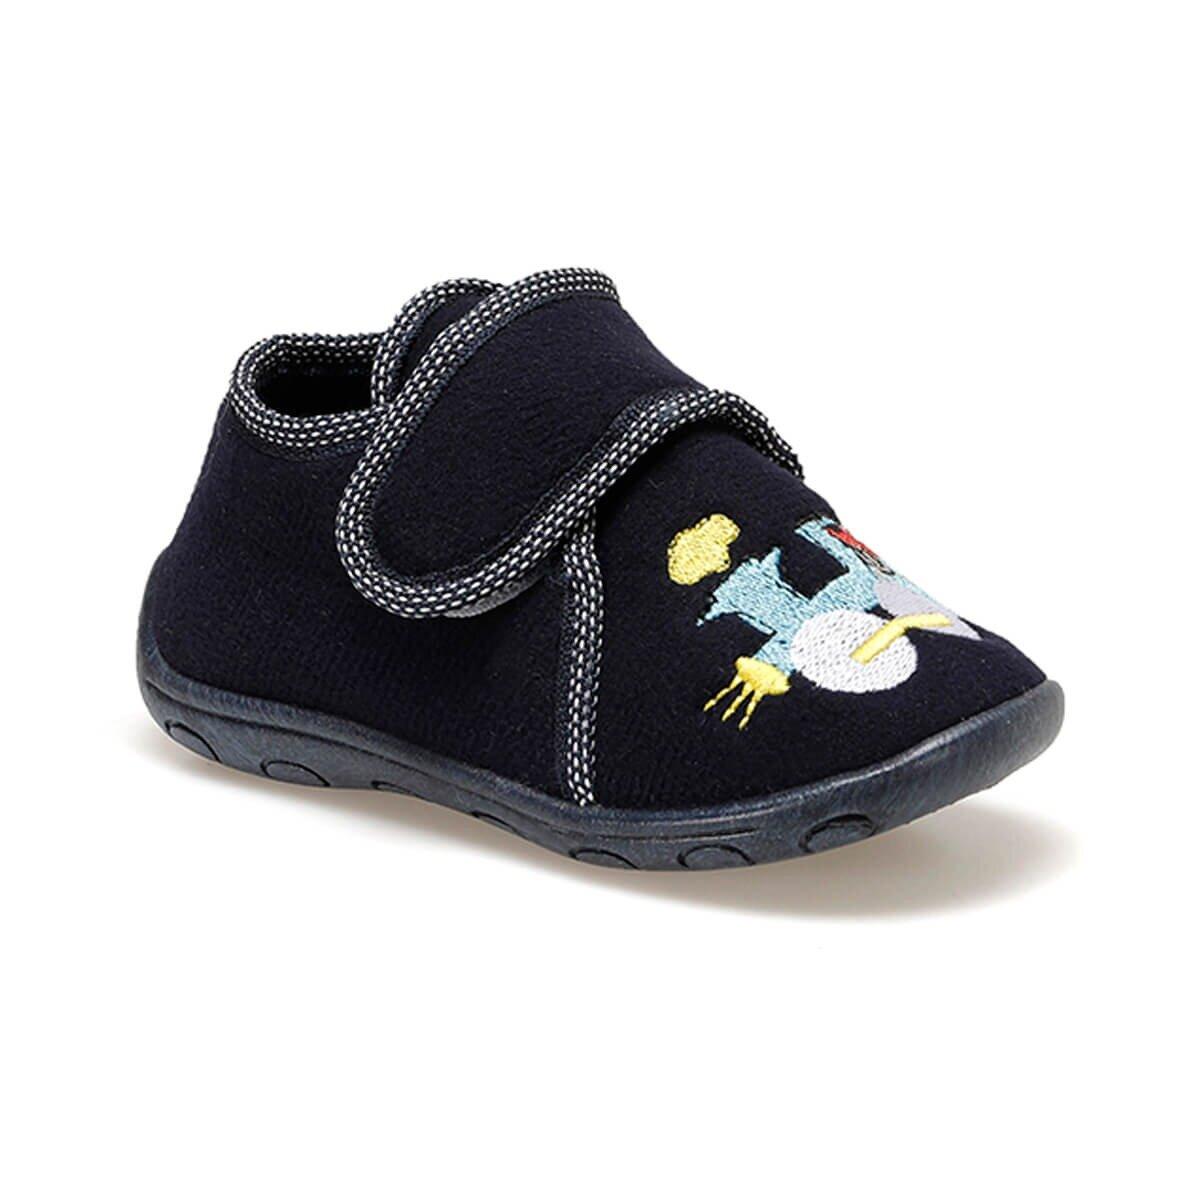 FLO 92.510920.P Navy Blue Male Child Panduf Polaris